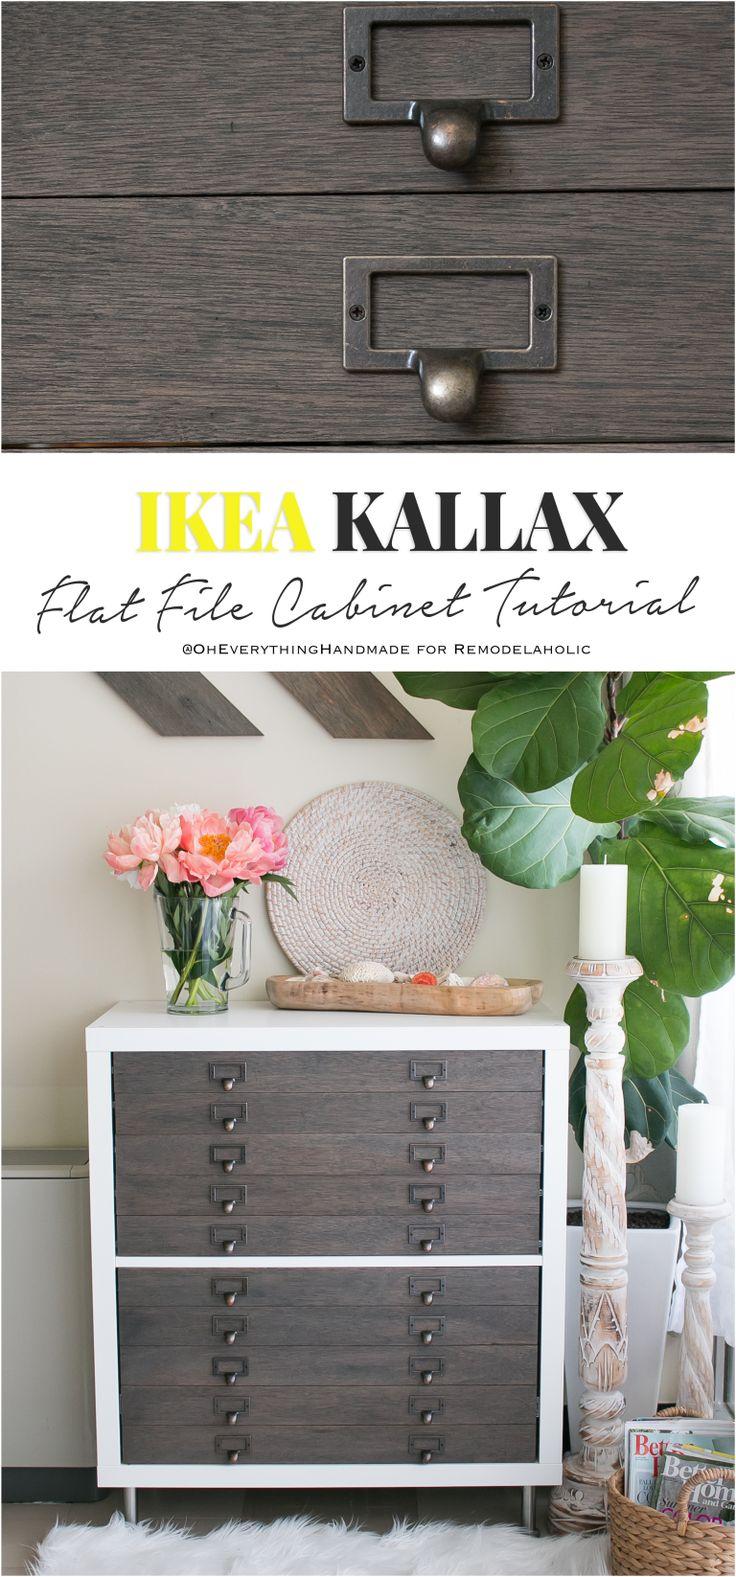 IKEA Hack Kallax Cube Shelf into Card Catalog Style Flat